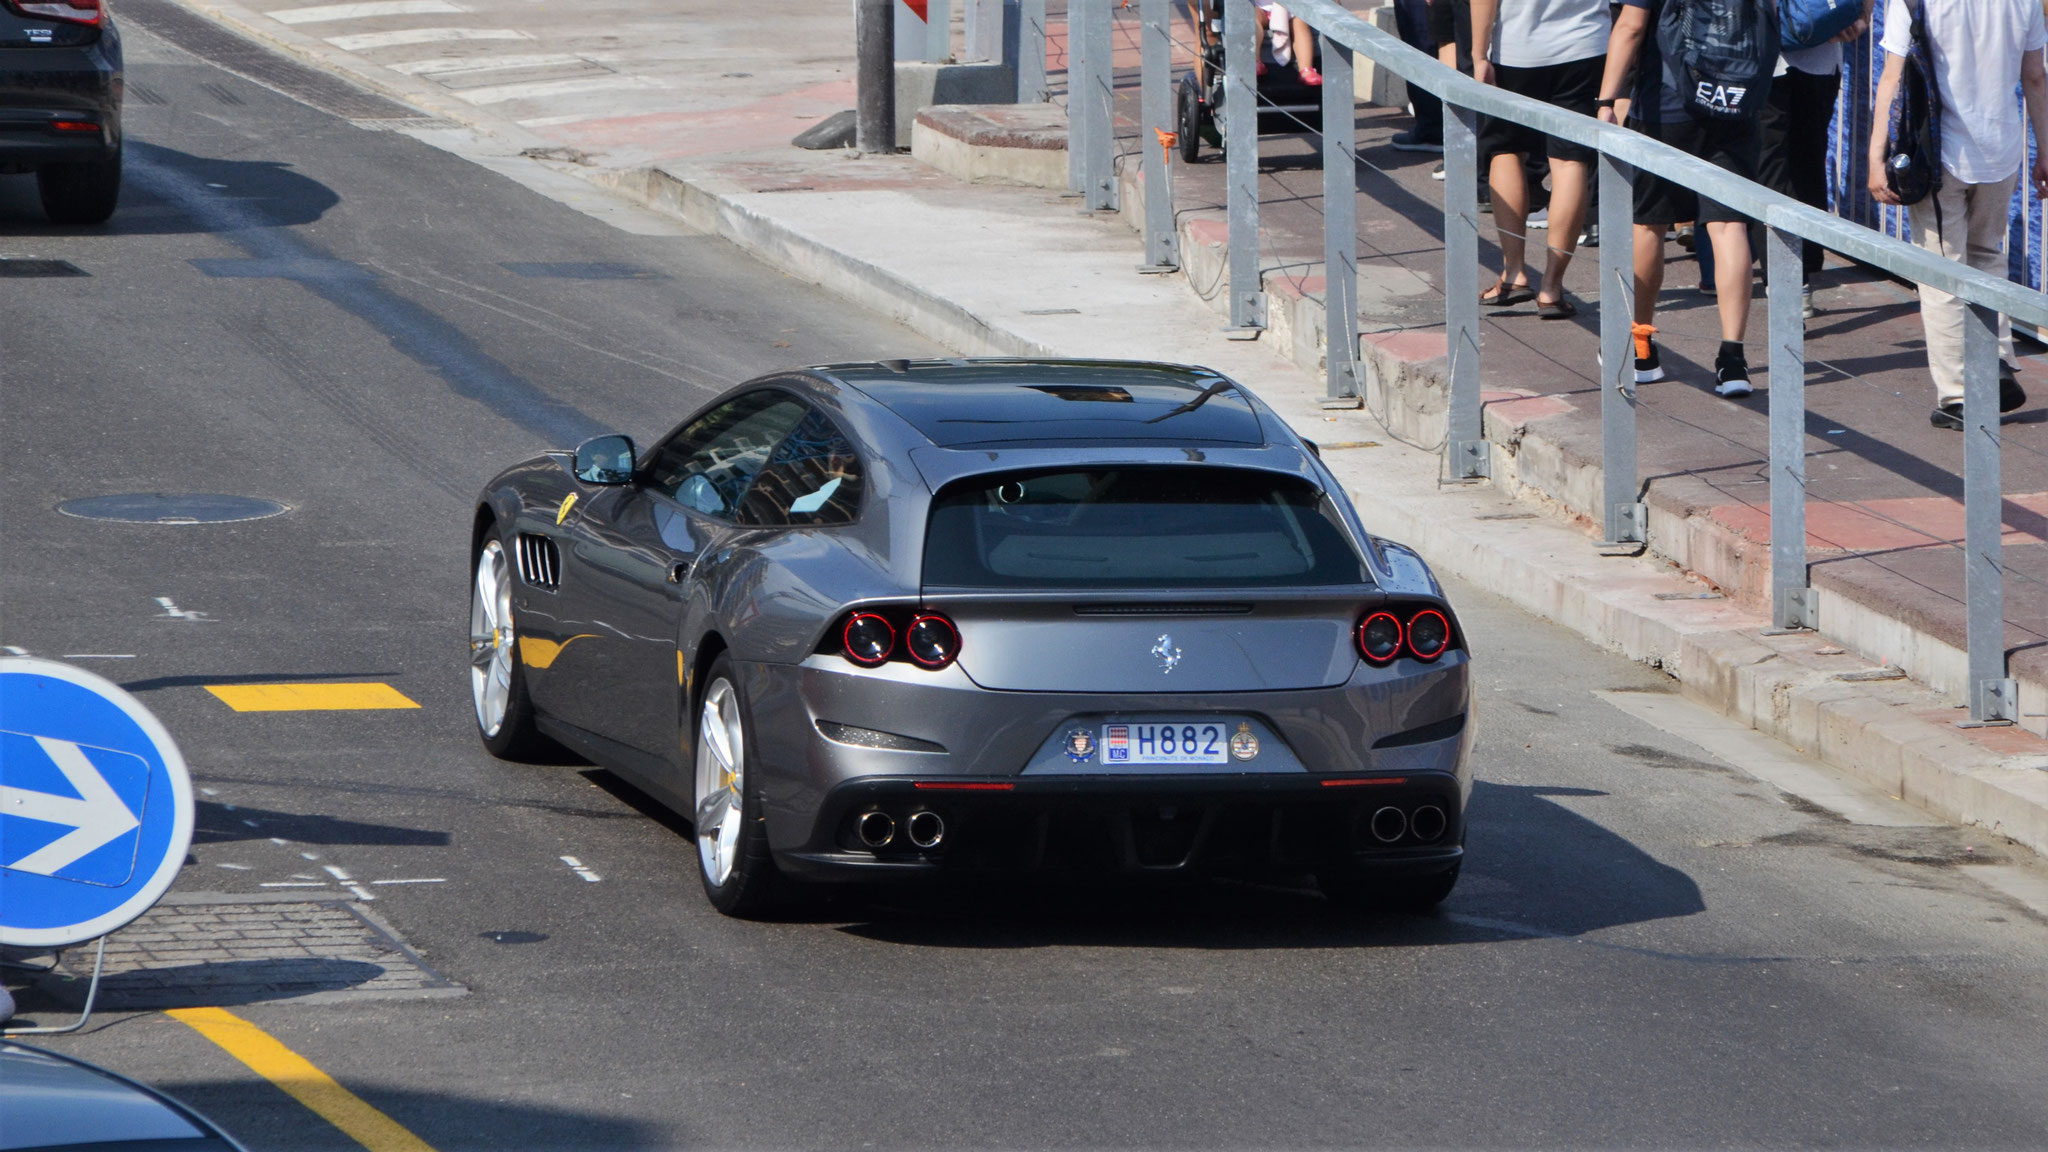 Ferrari GTC4 Lusso - H882 (MC)